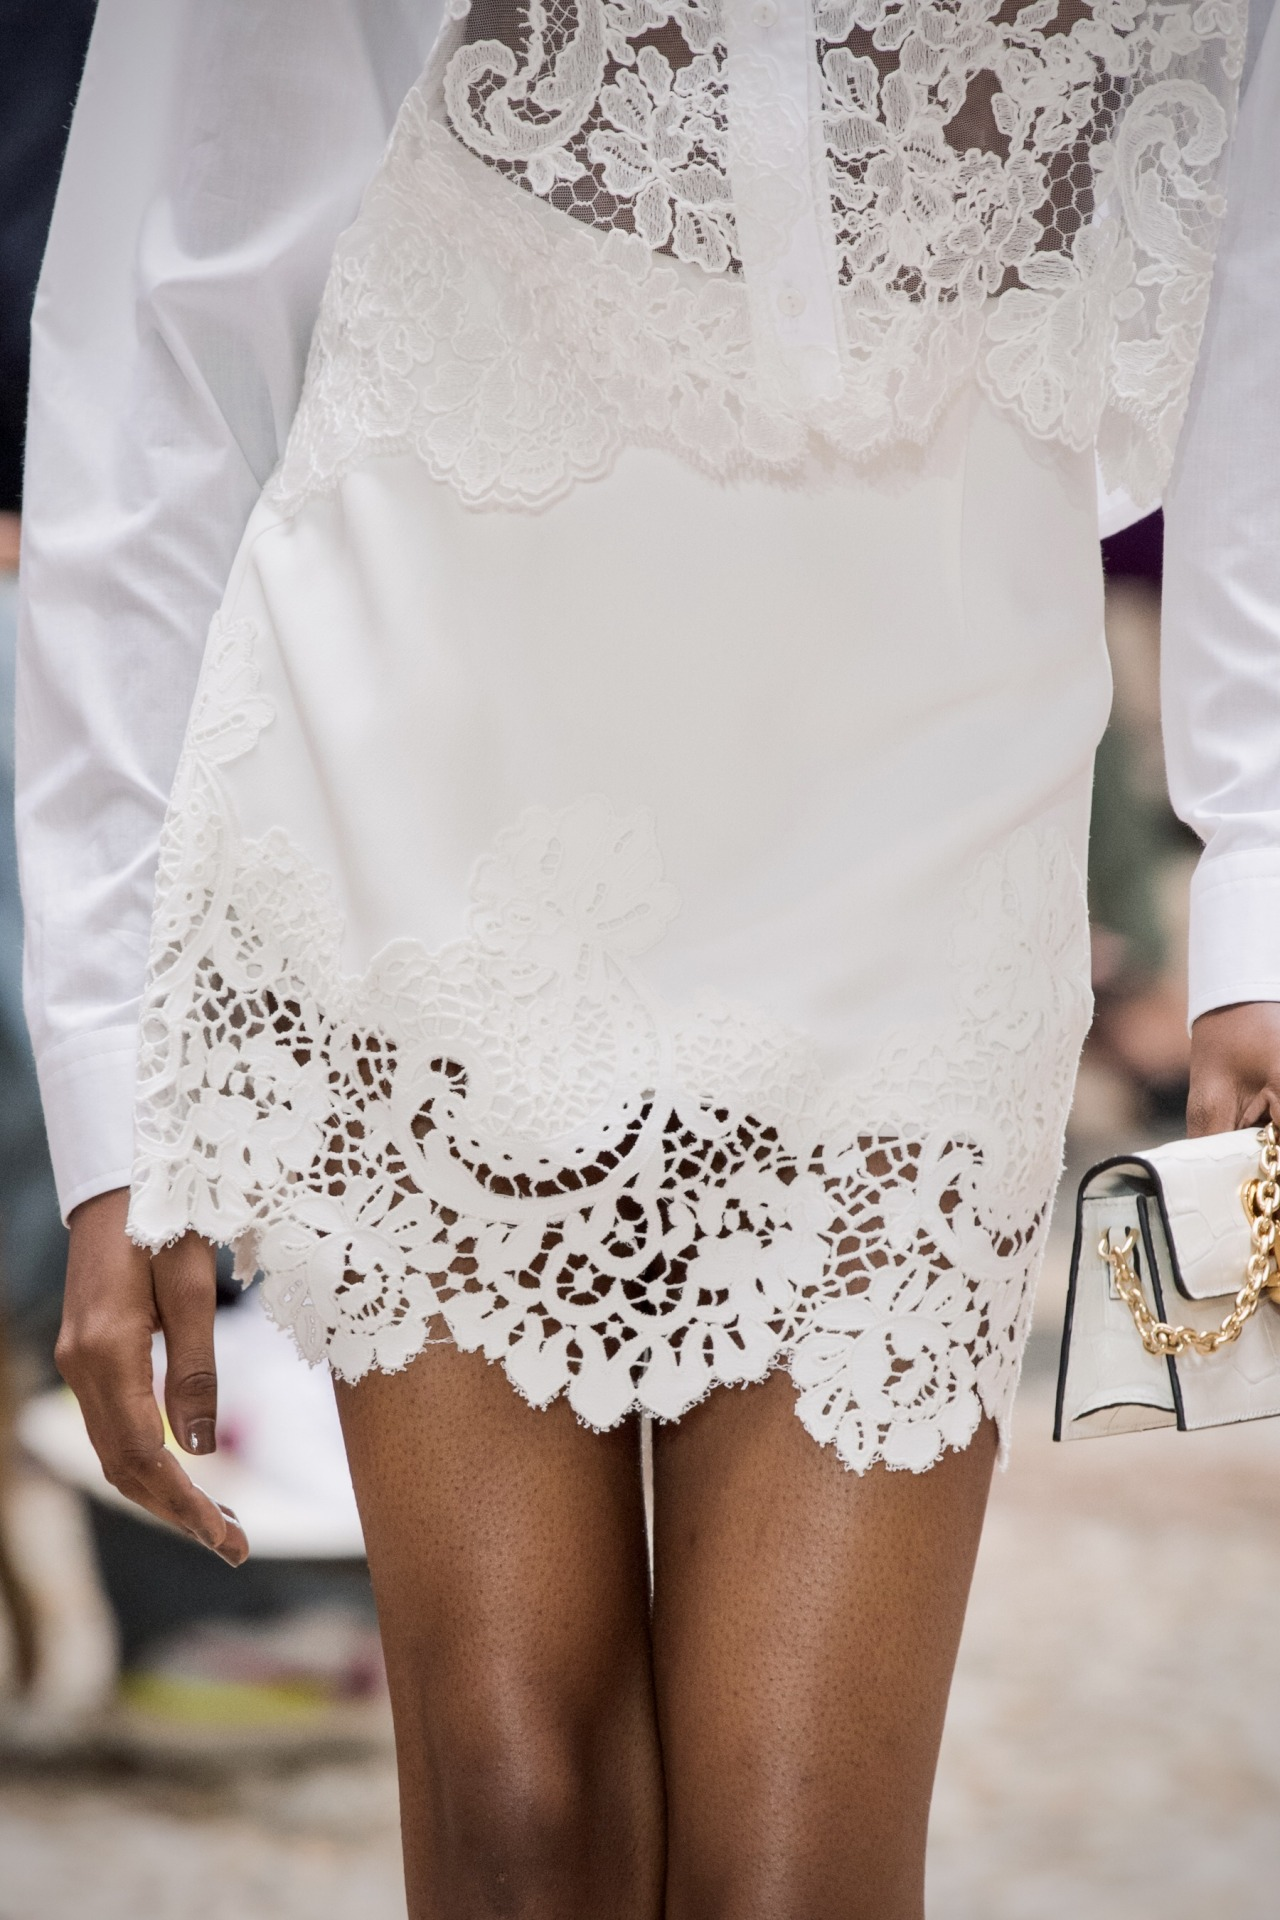 Ermanno Scervino   Spring/Summer 2022 #Ermanno Scervino#fashion#style#mfw#runway#catwalk#ss22#details#fashion details#fashionedit#fashion edit